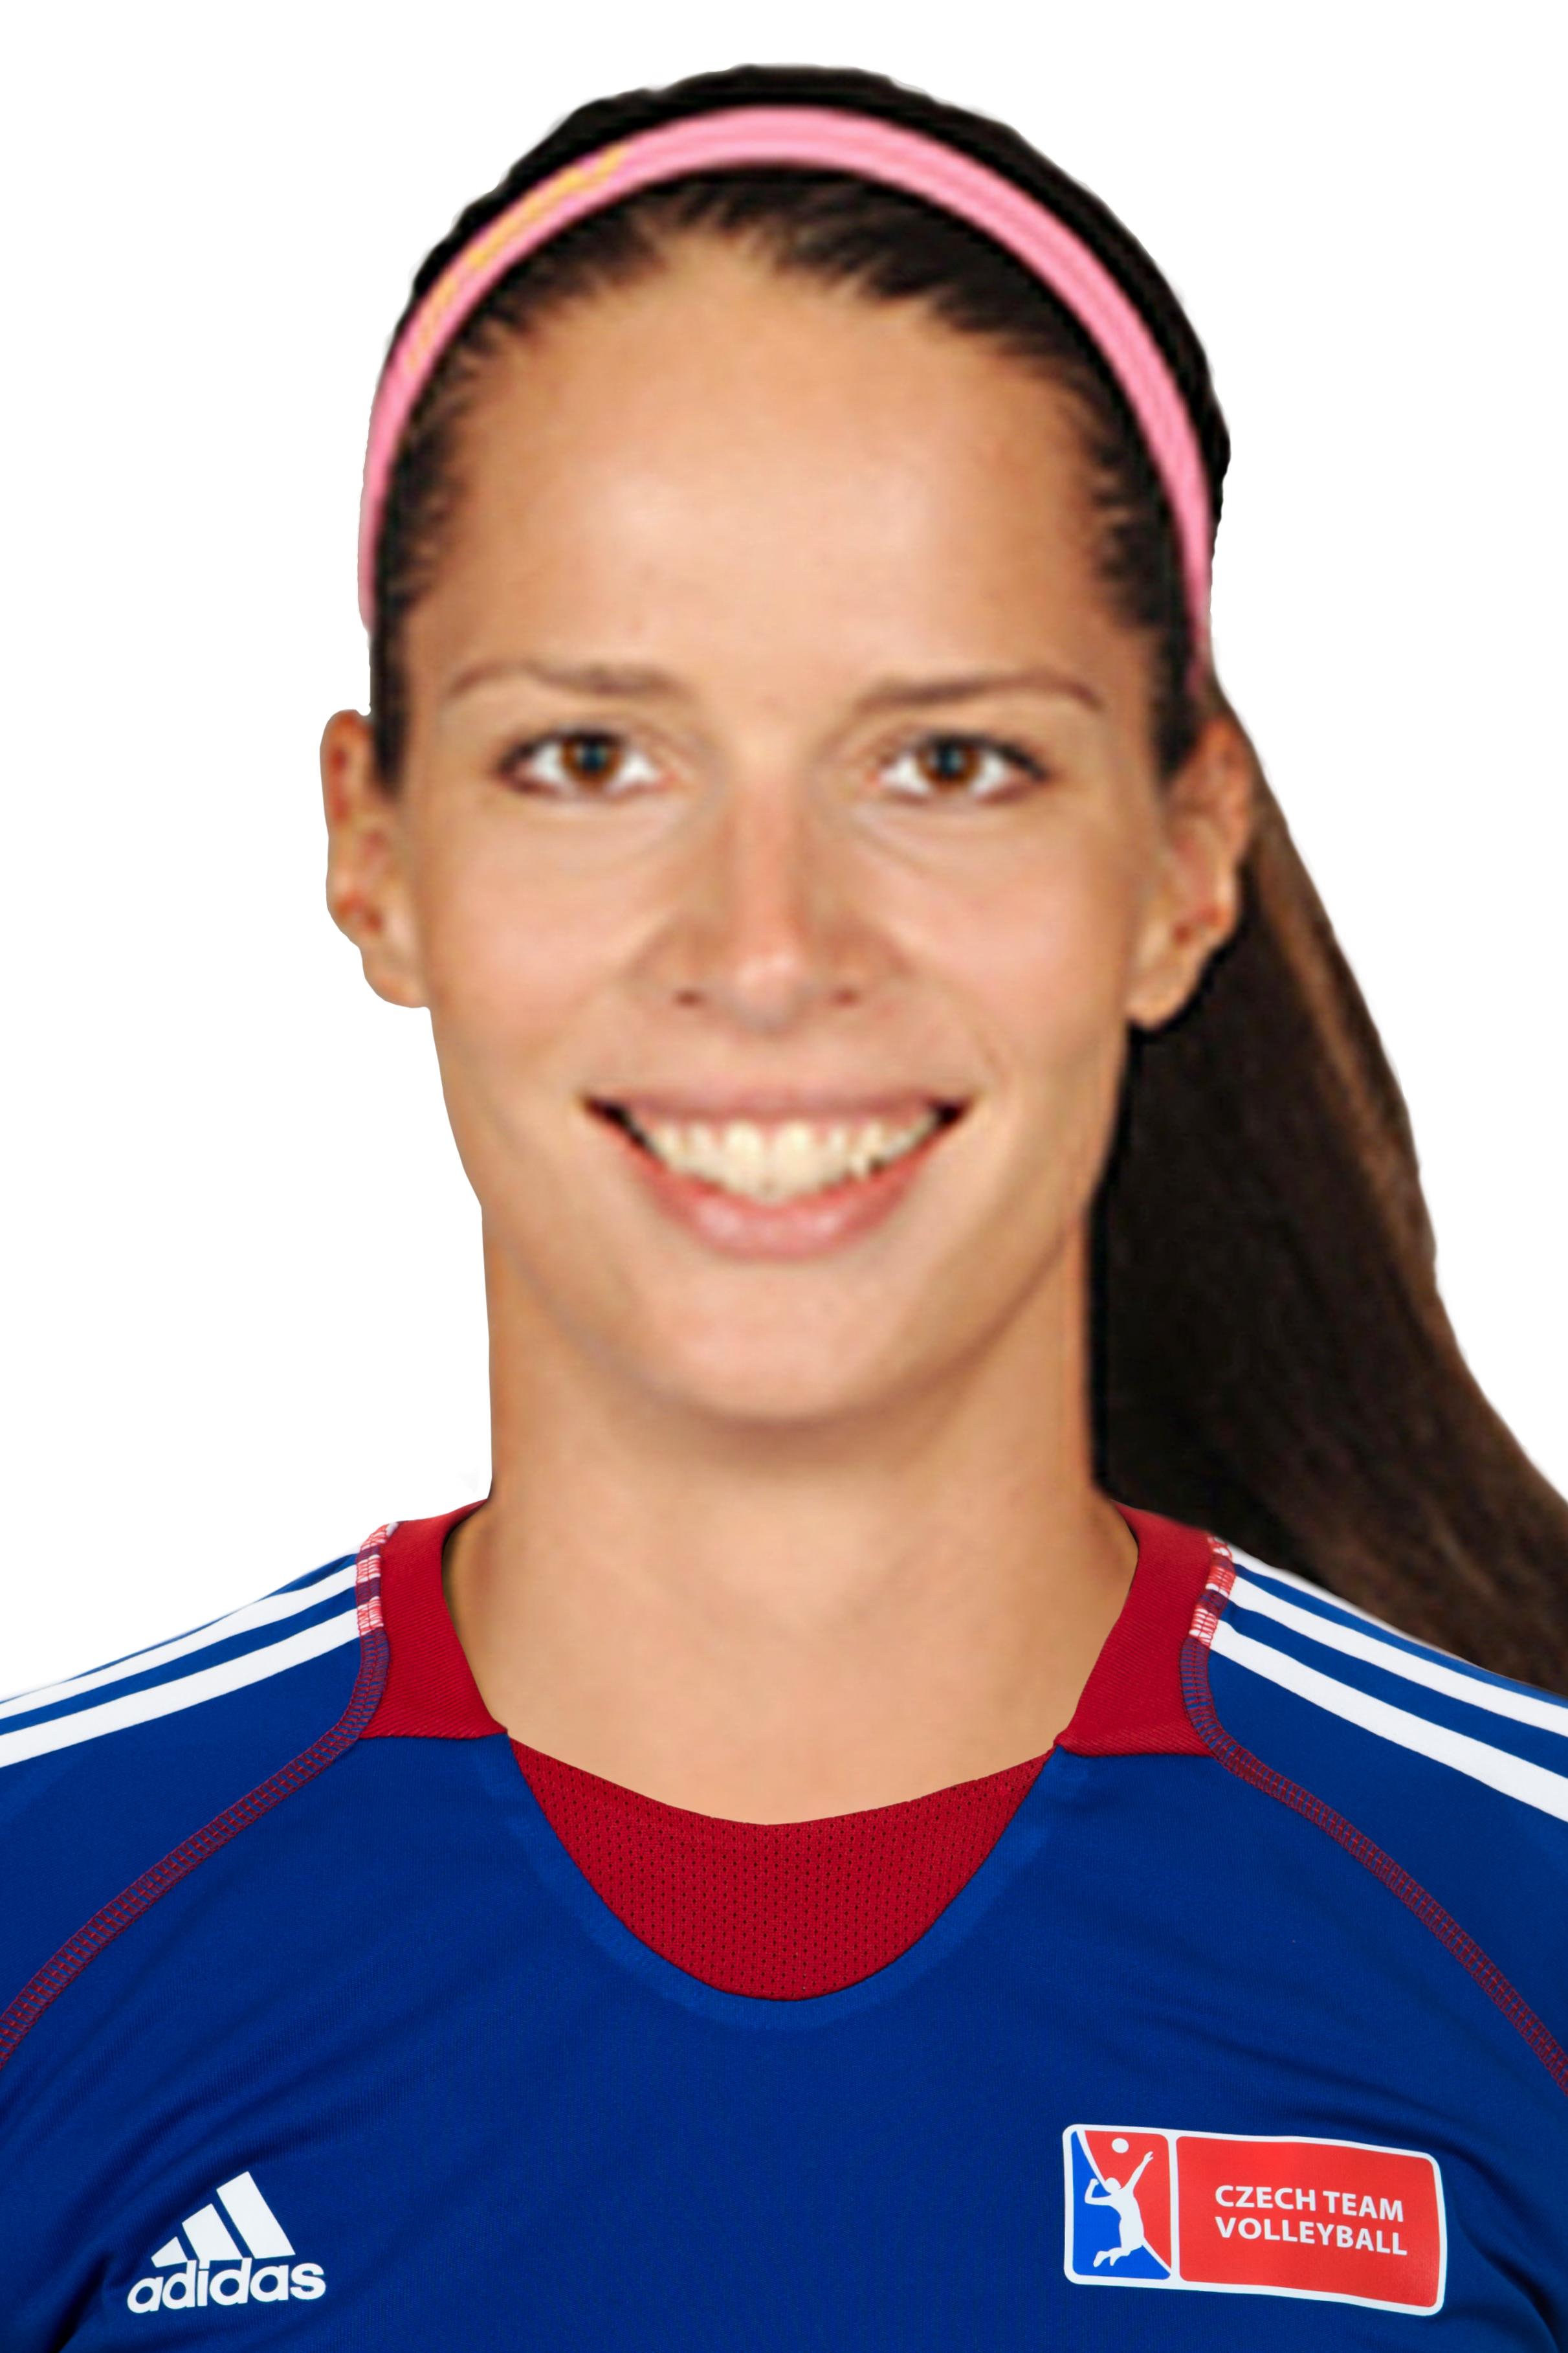 Monika Smidova